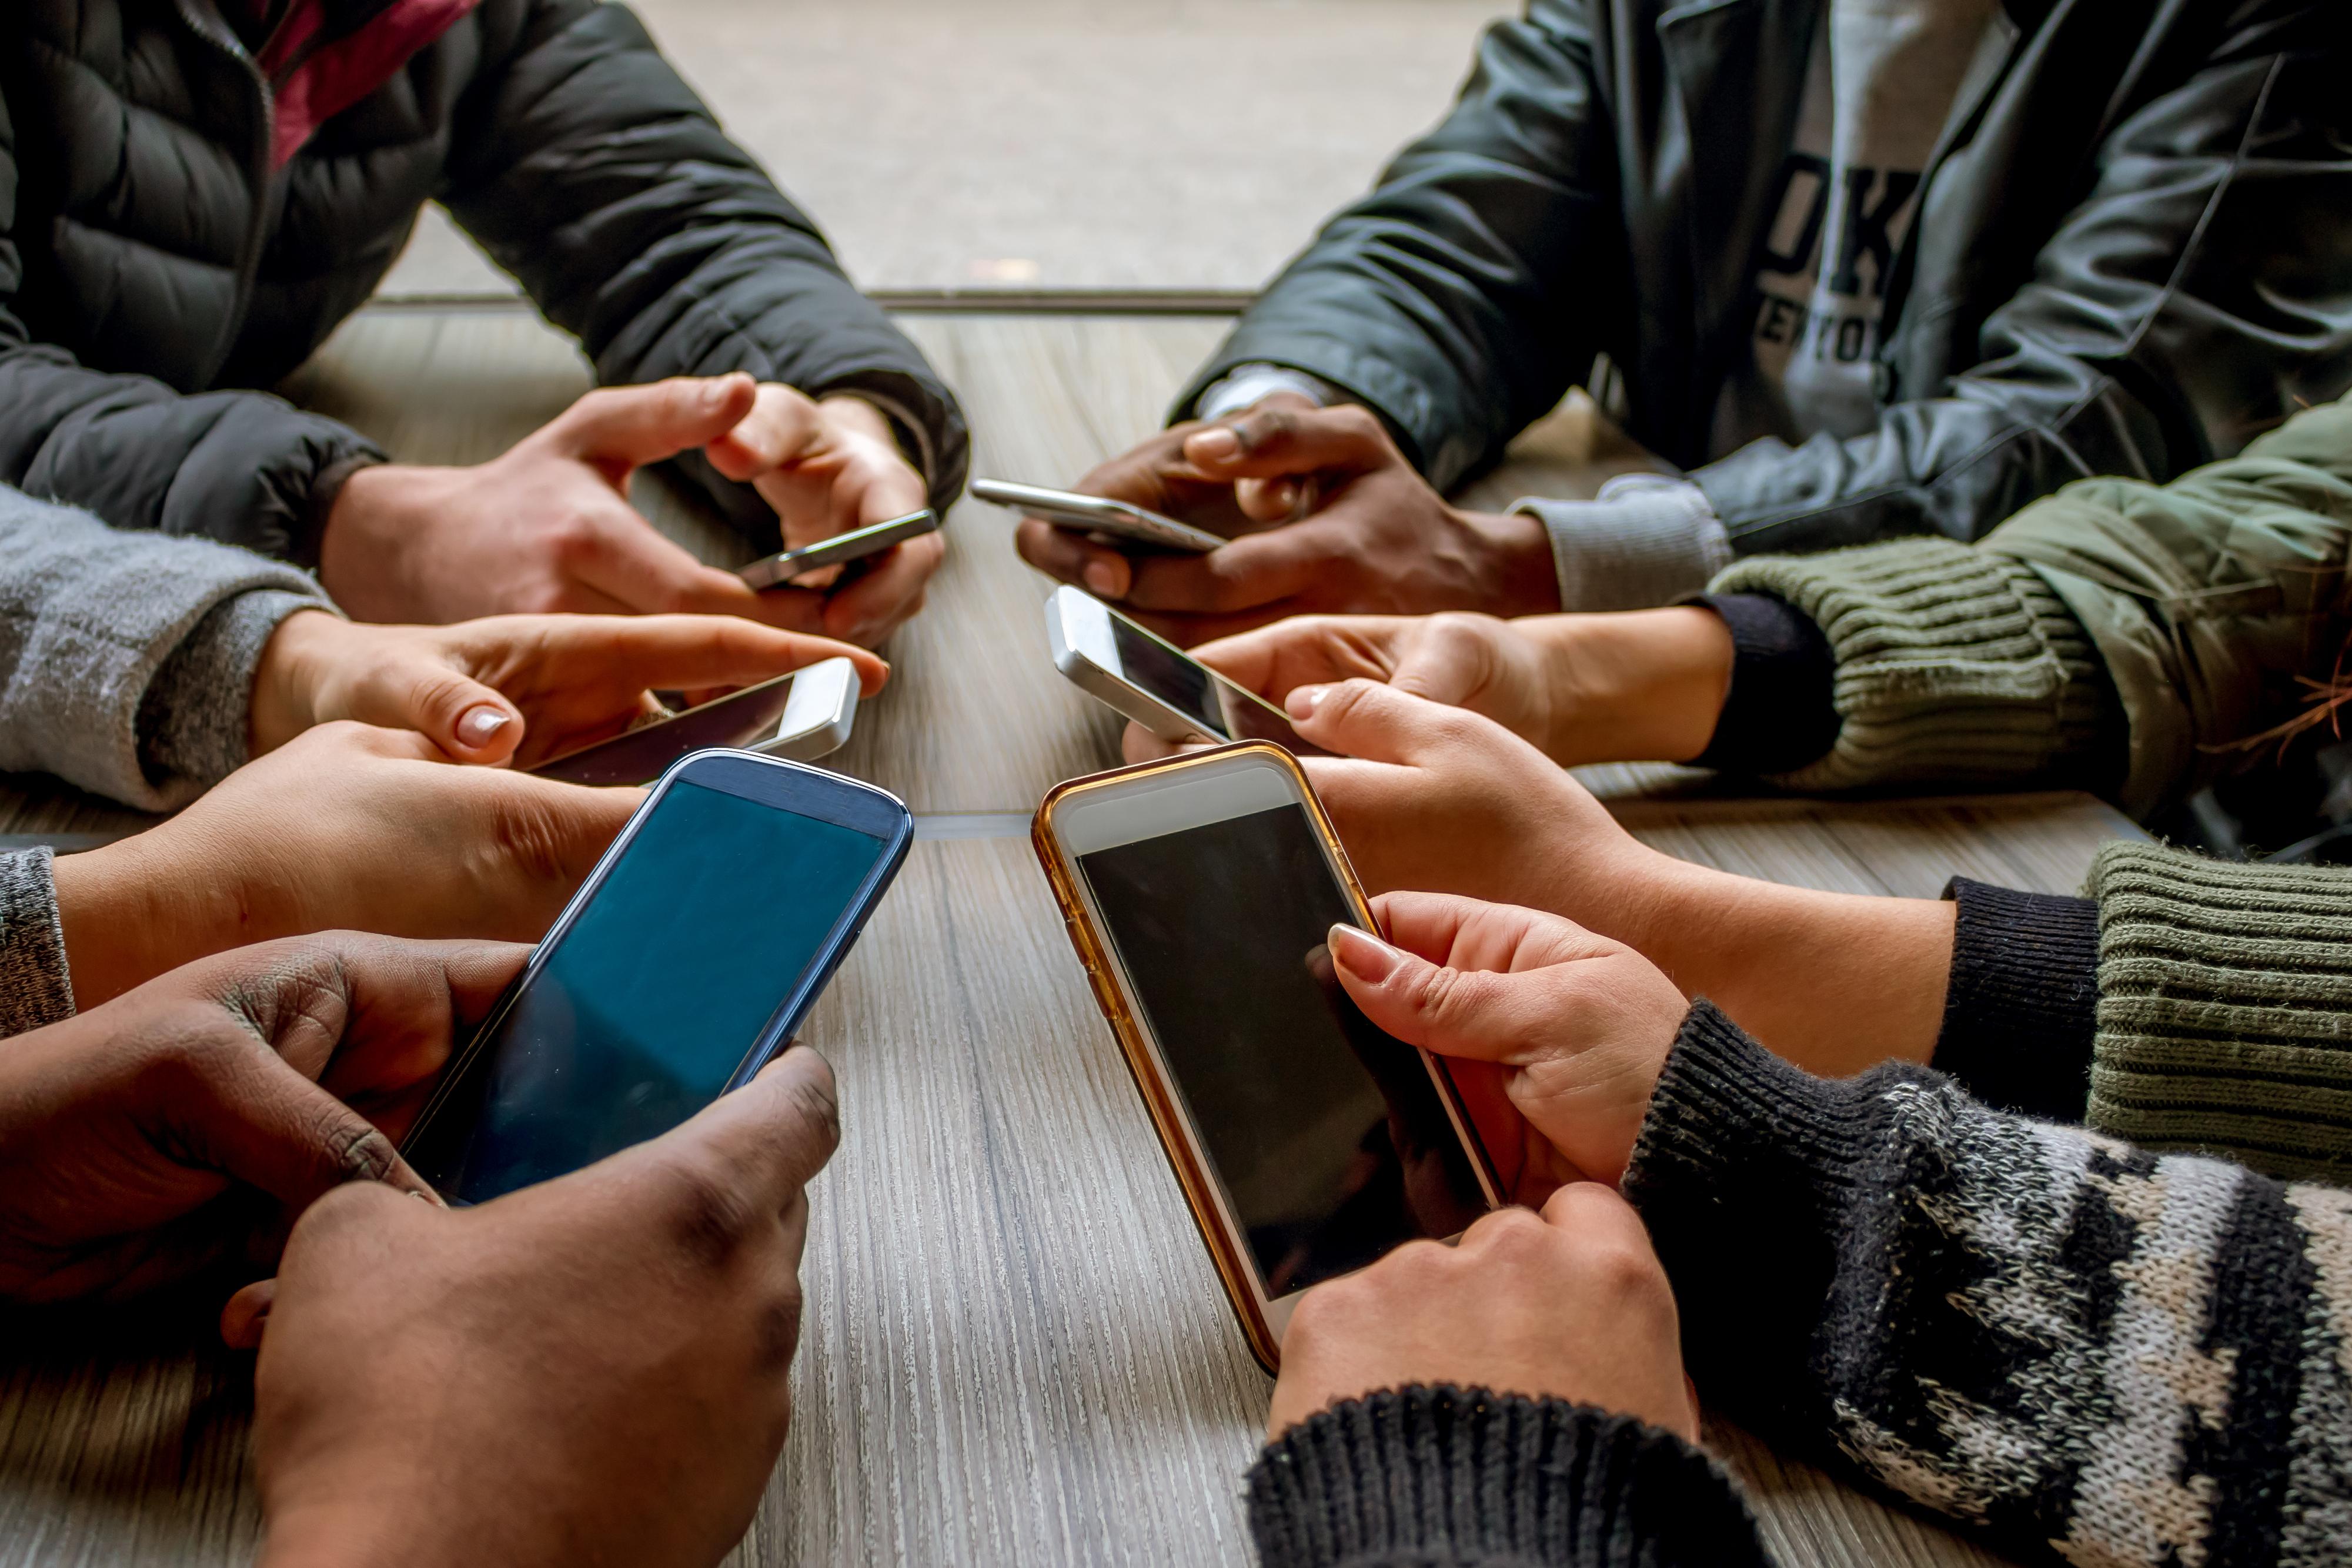 Group - Holding Phones.jpg